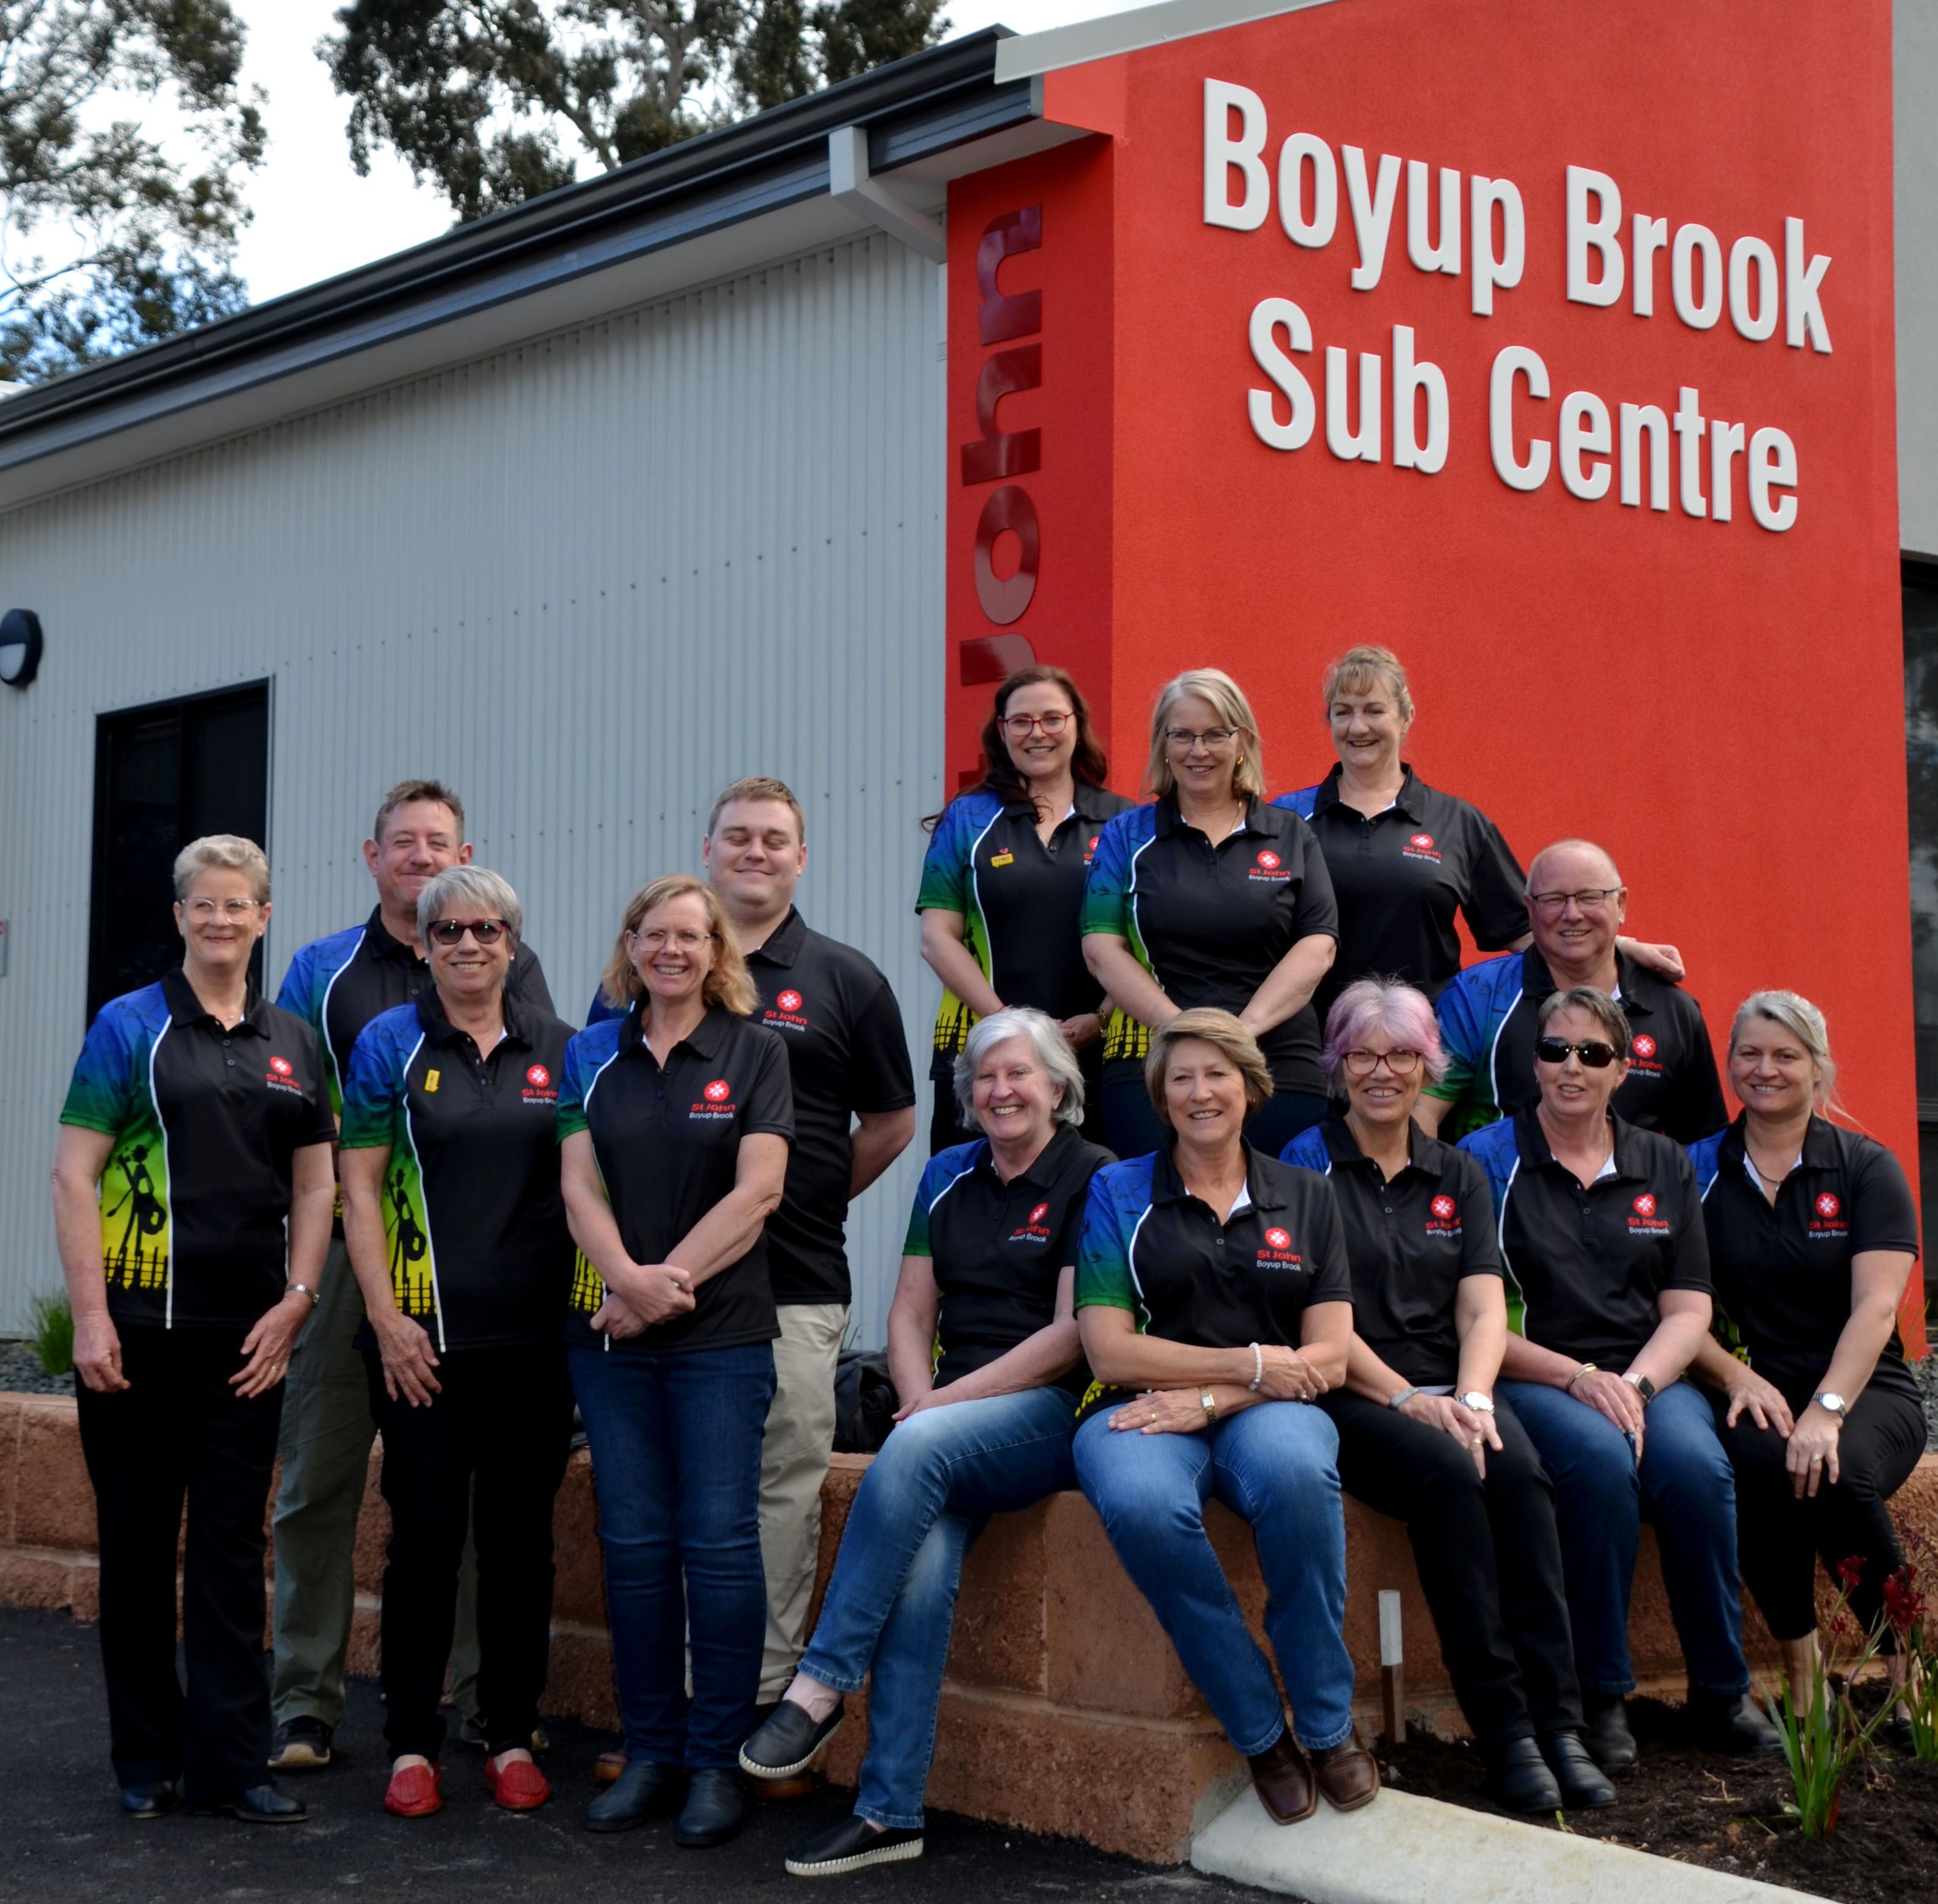 Boyup Brook Sub Centre 1